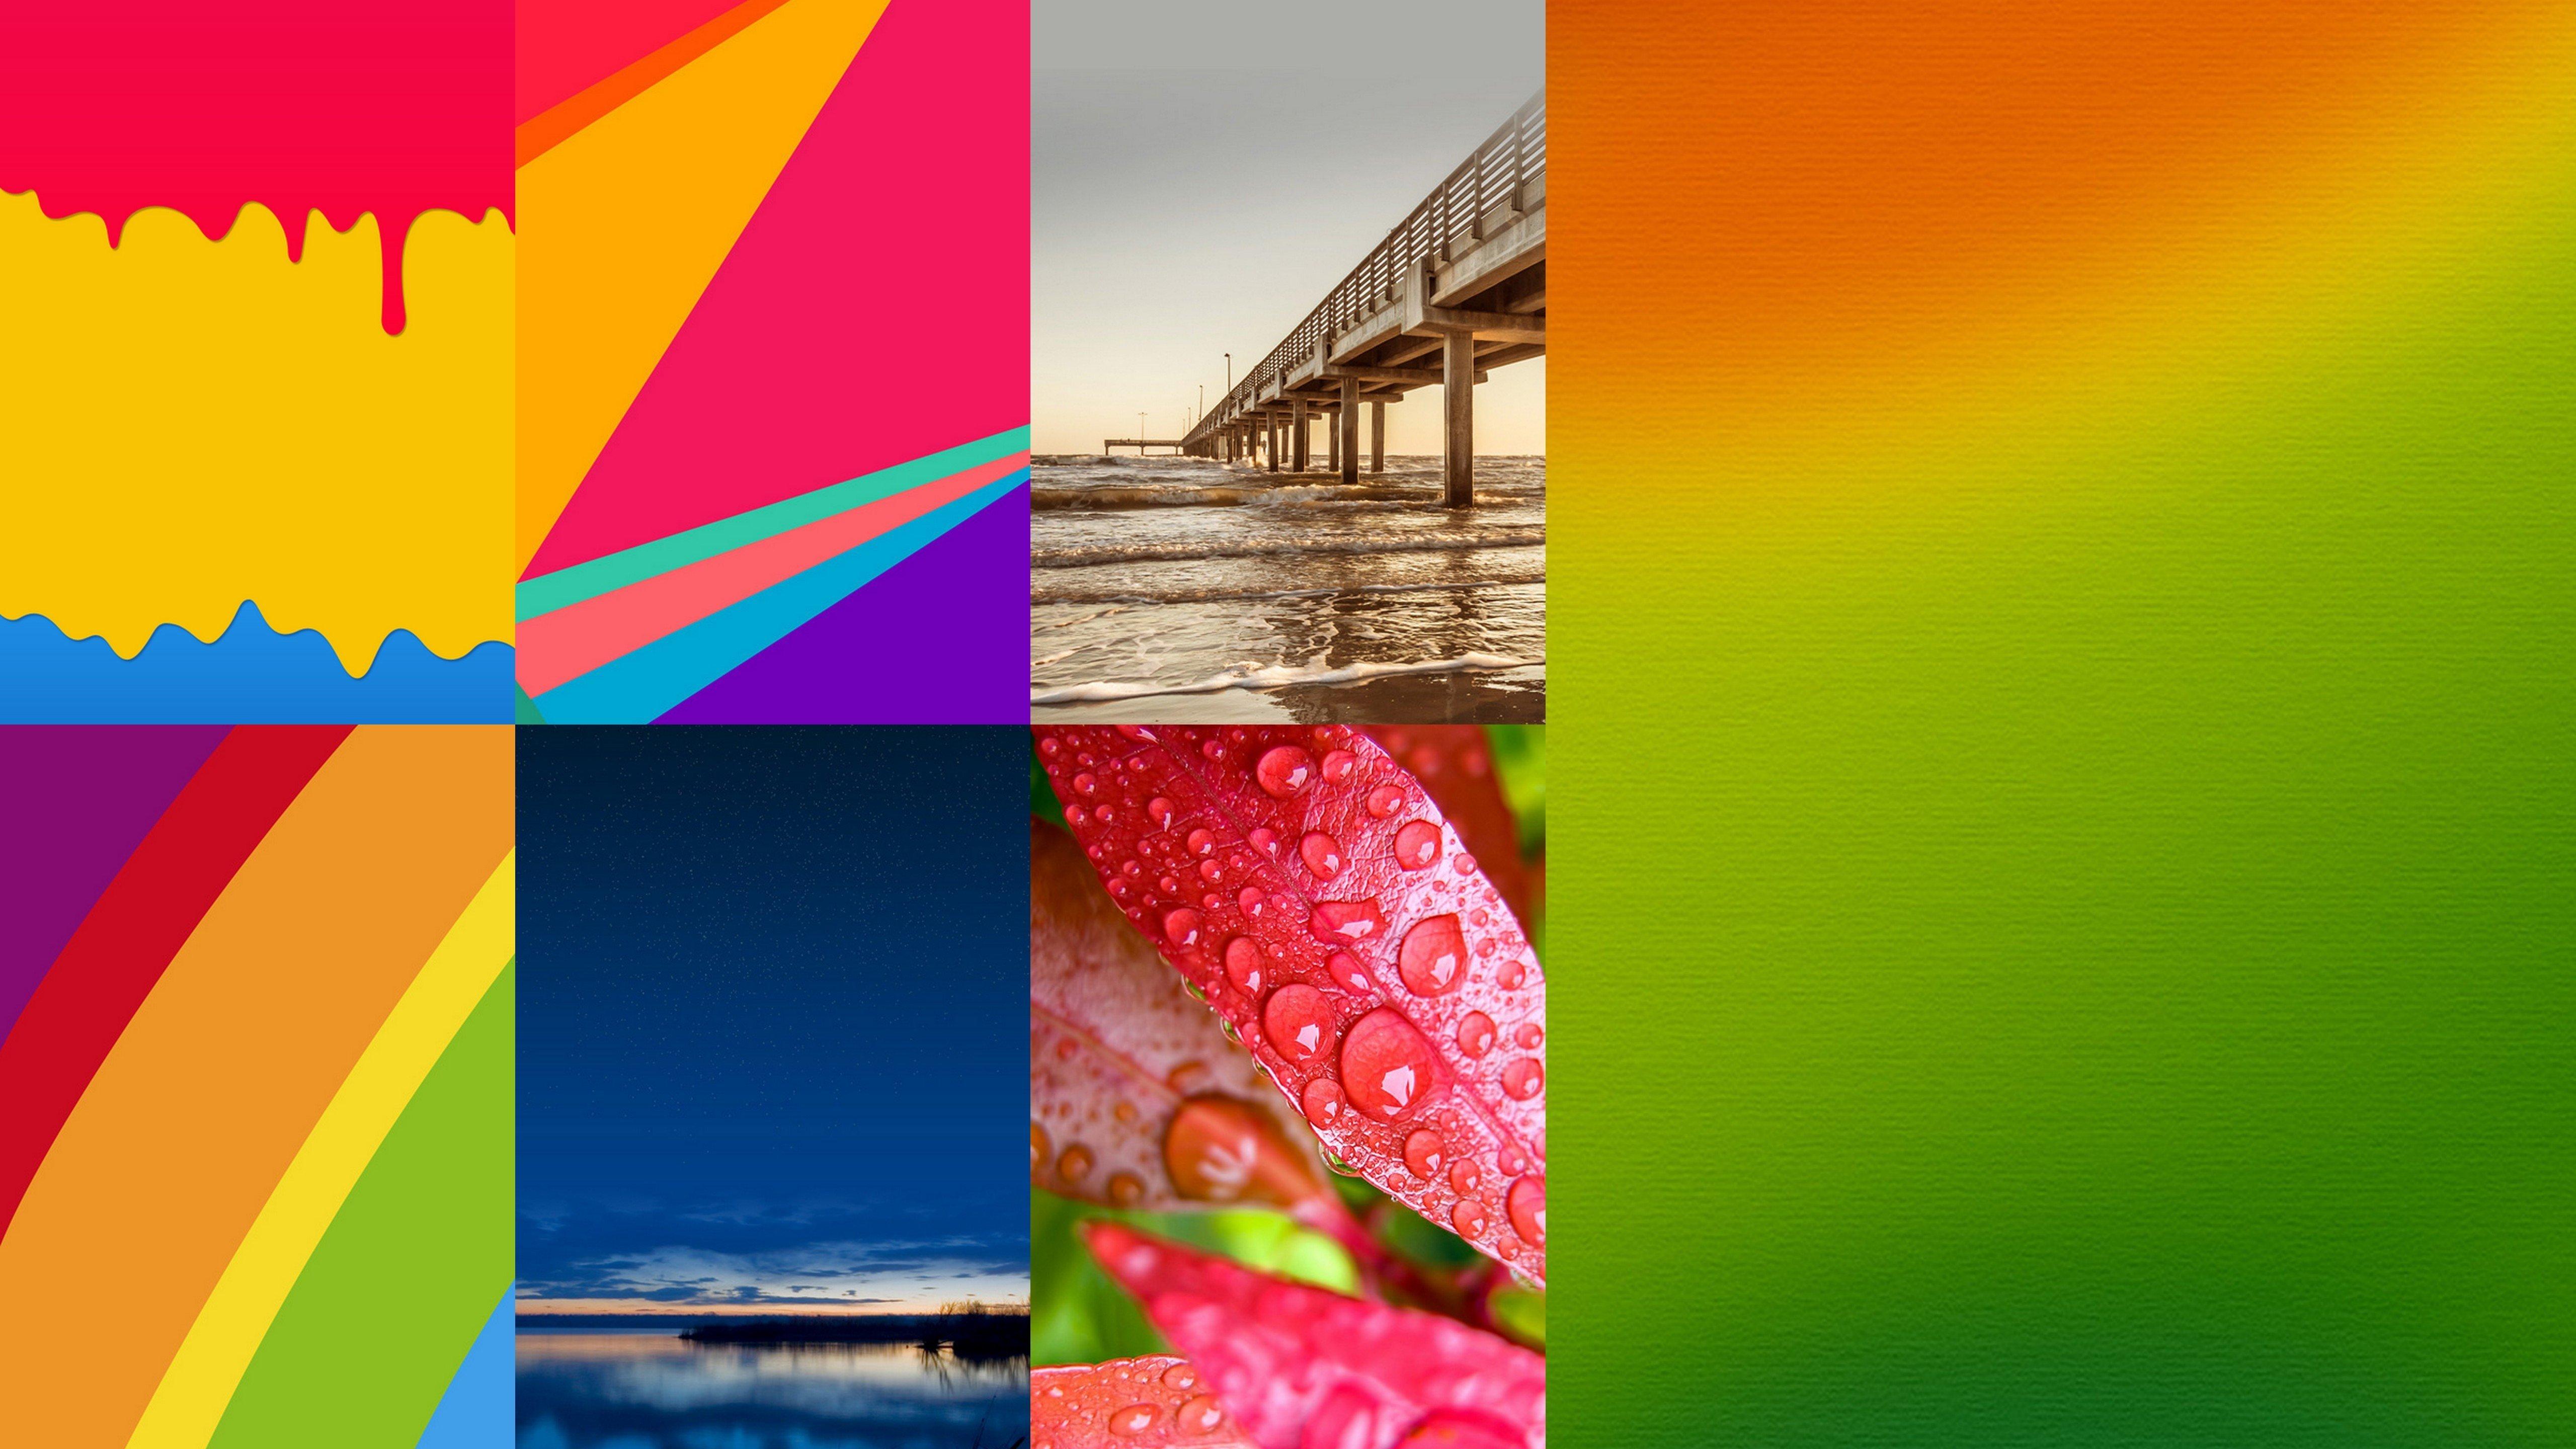 Download Vivo X7 Stock Hd Wallpapers: Download Vivo X5 Max+ Stock HQ Wallpapers